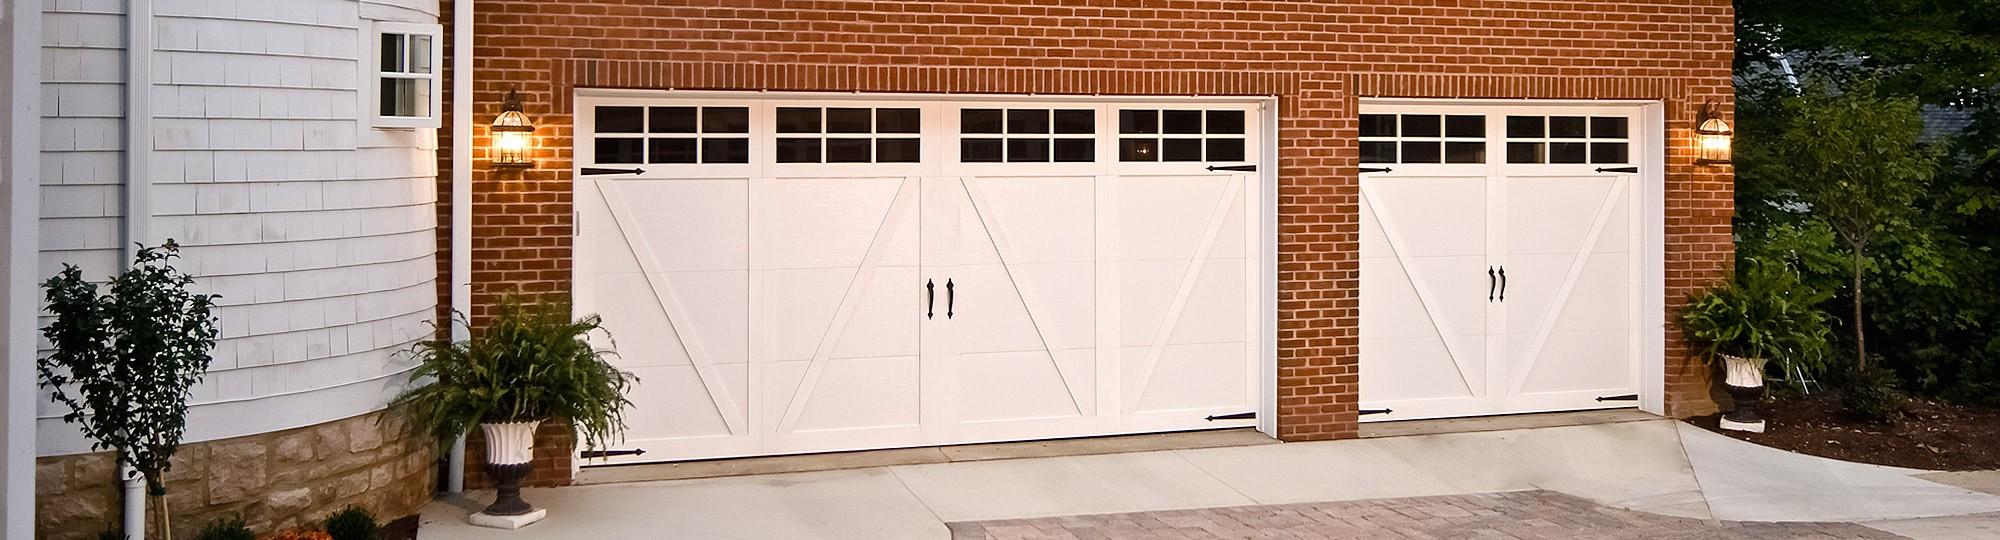 garage door repair bolingbrook il bolingbrook il garage